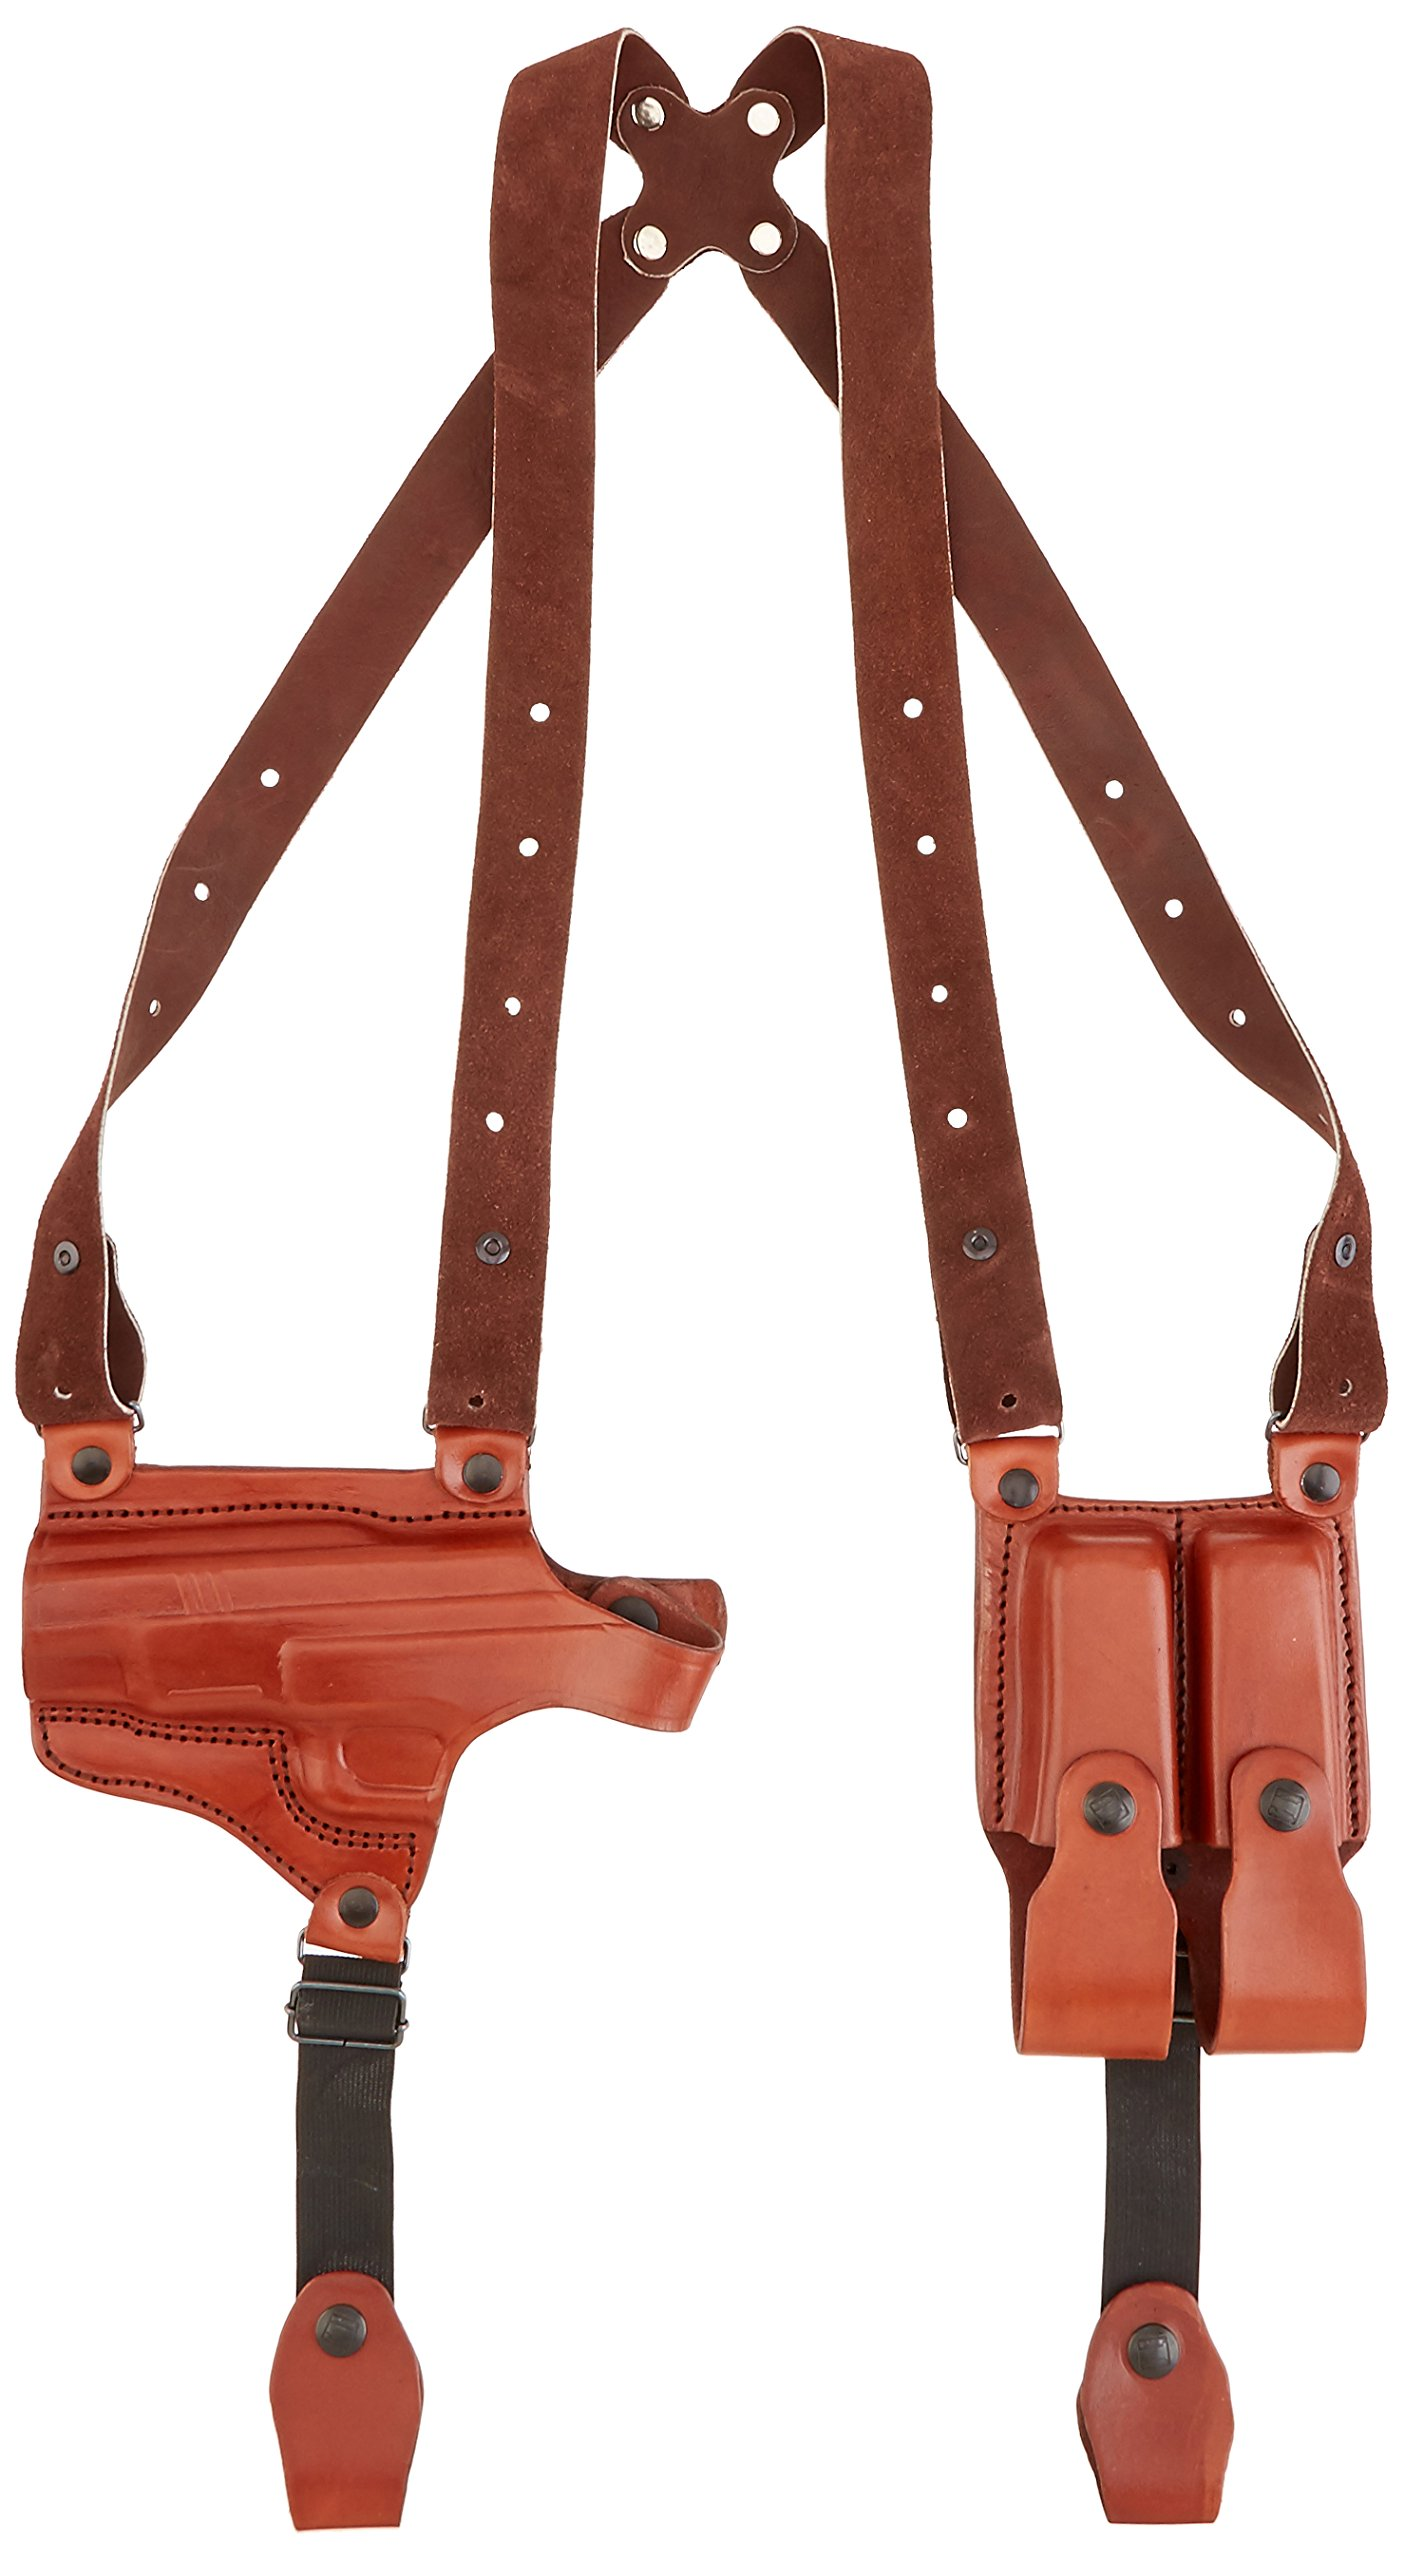 Tagua SH4-653 Full Slide Shoulder Holster, Springfield XD 40 Tactical, Brown, Left Hand